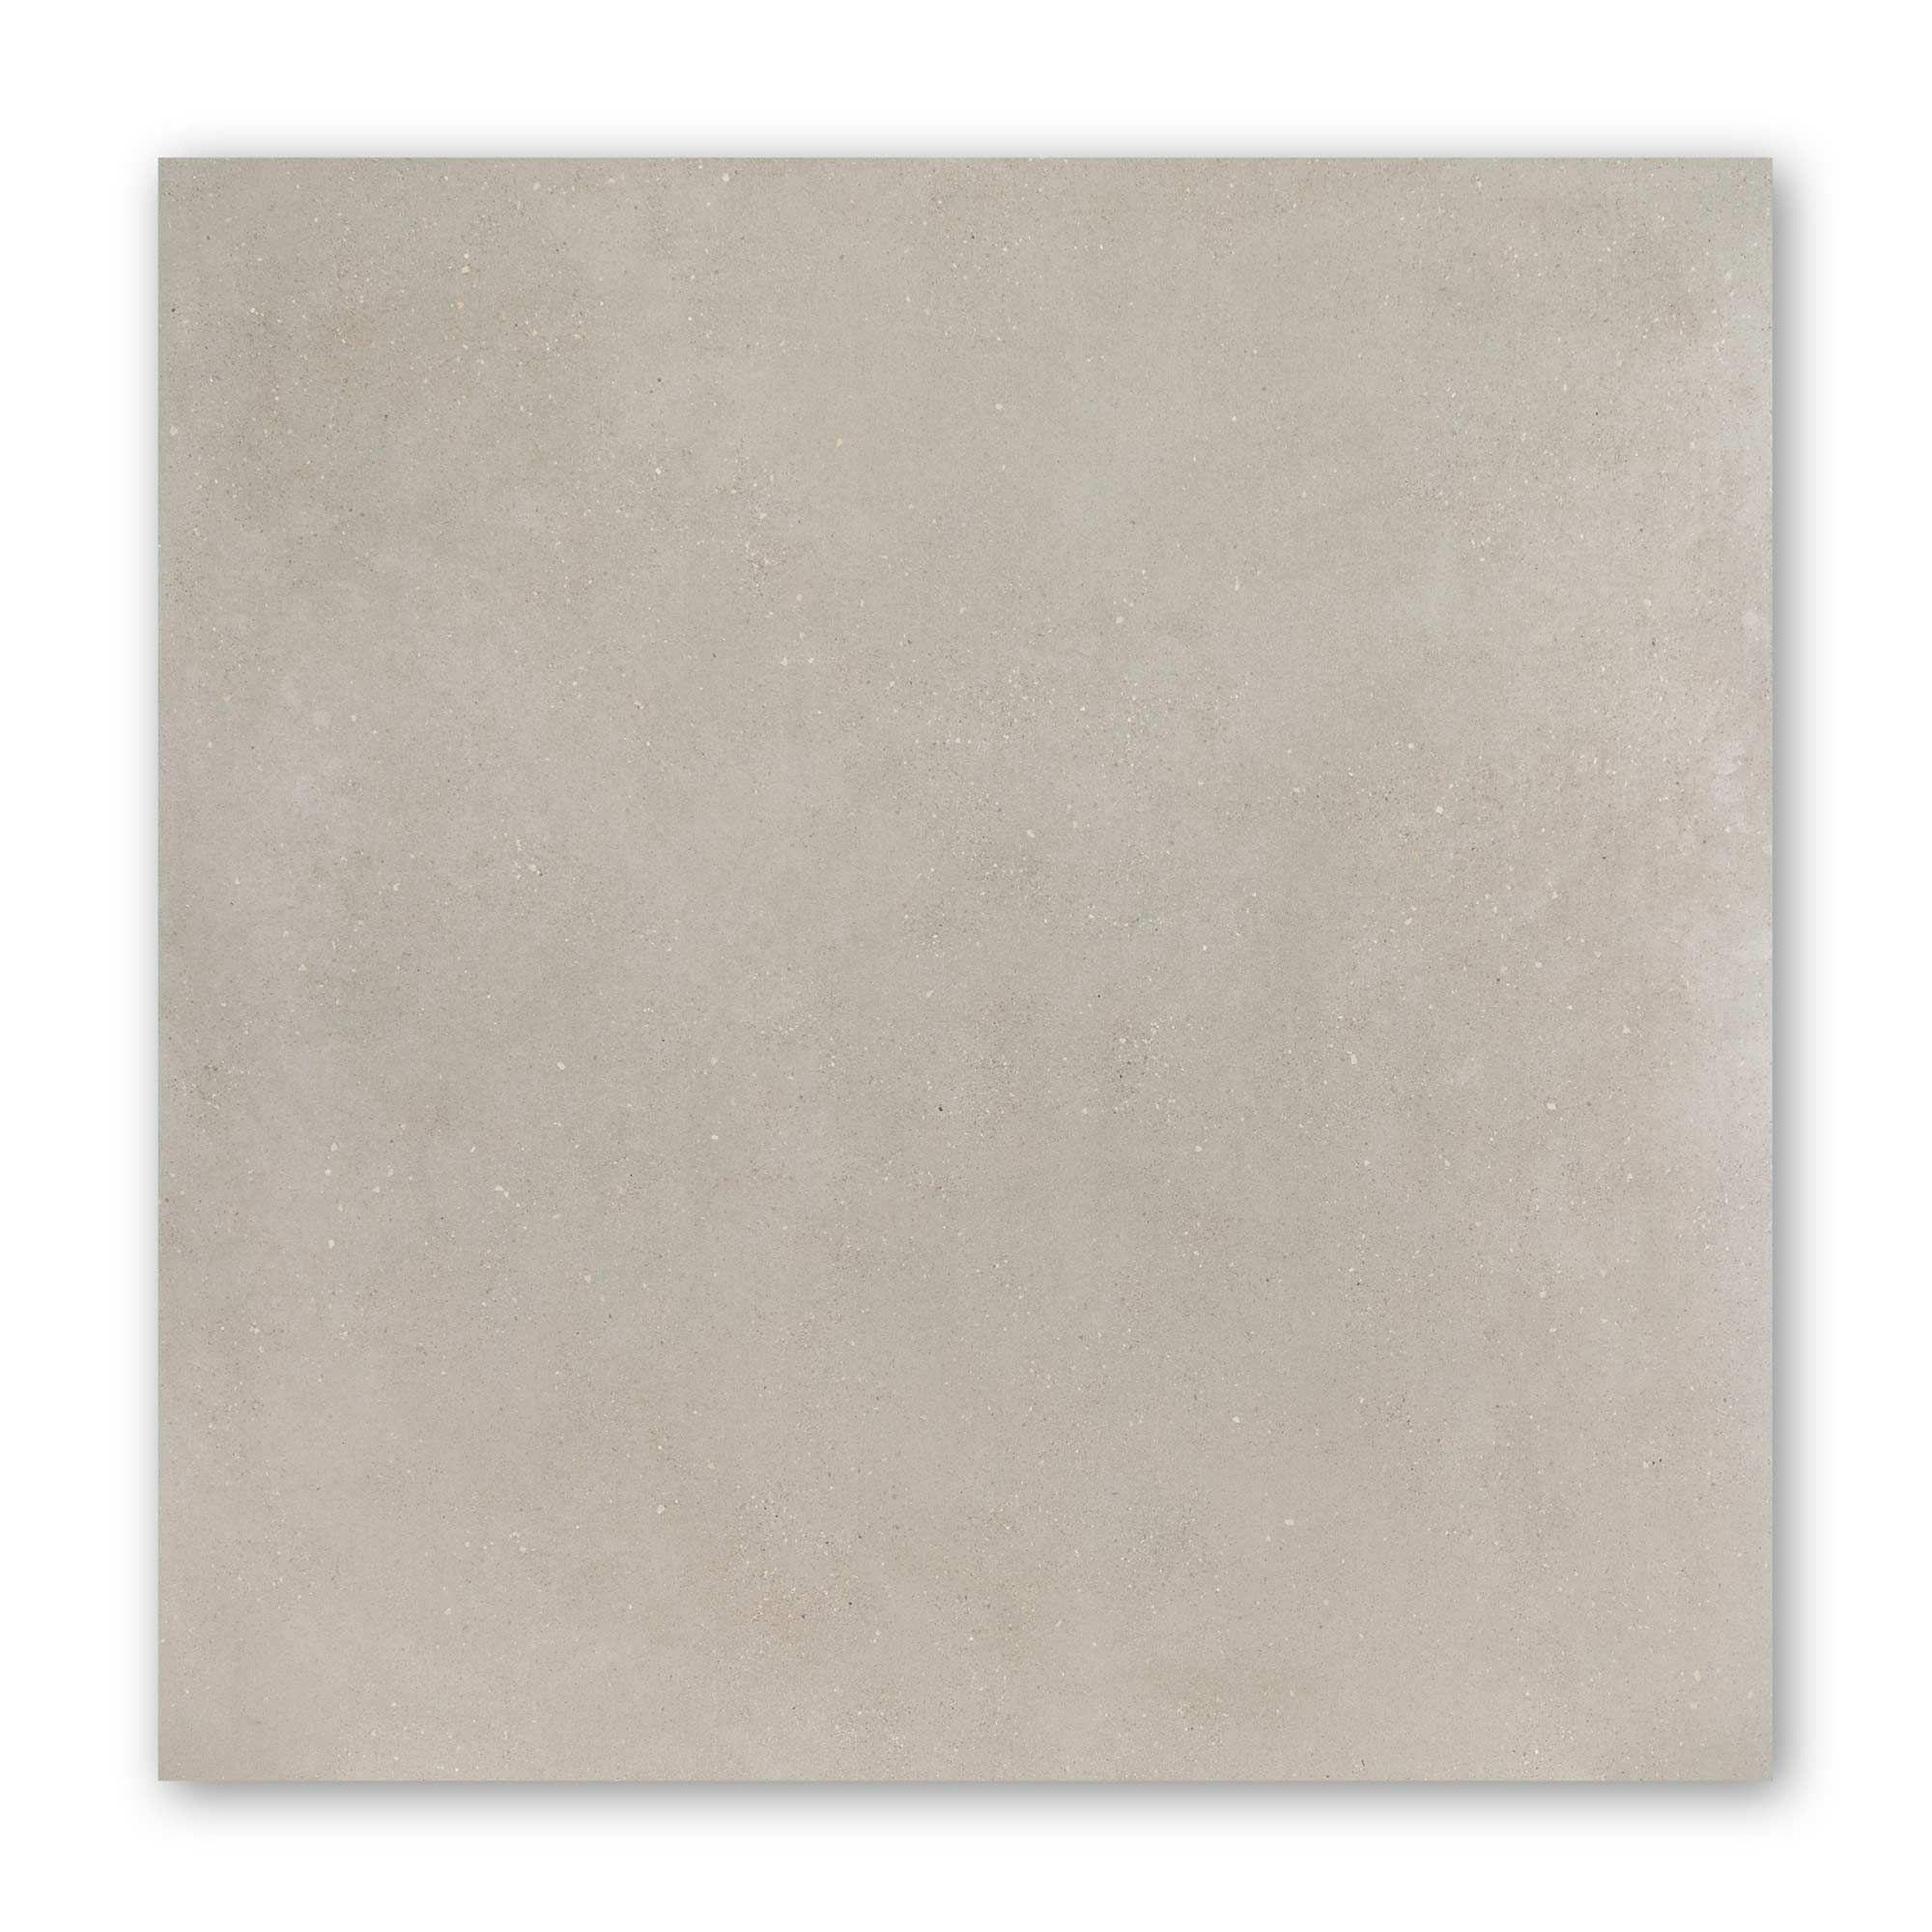 Umbrian Grey 60x60